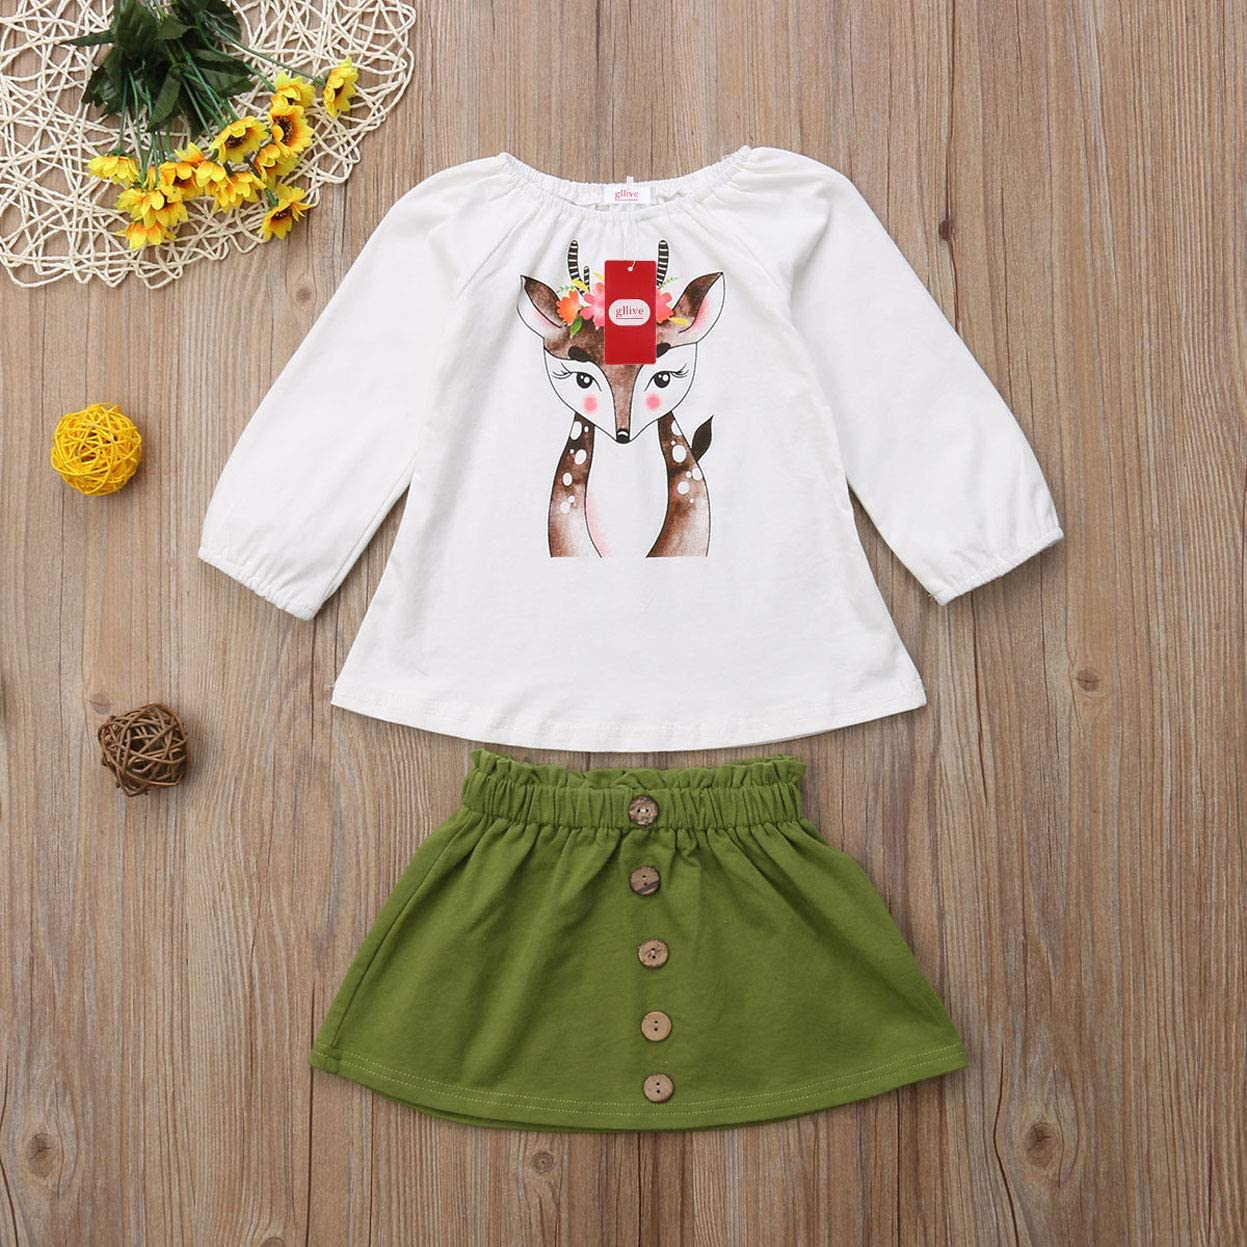 Vohawsa Toddler Baby Girls Long Sleeve Ruffle T Shirt Tops Short Denim Skirts 2Pcs Summer Fall Casual Outfits Clothes Set